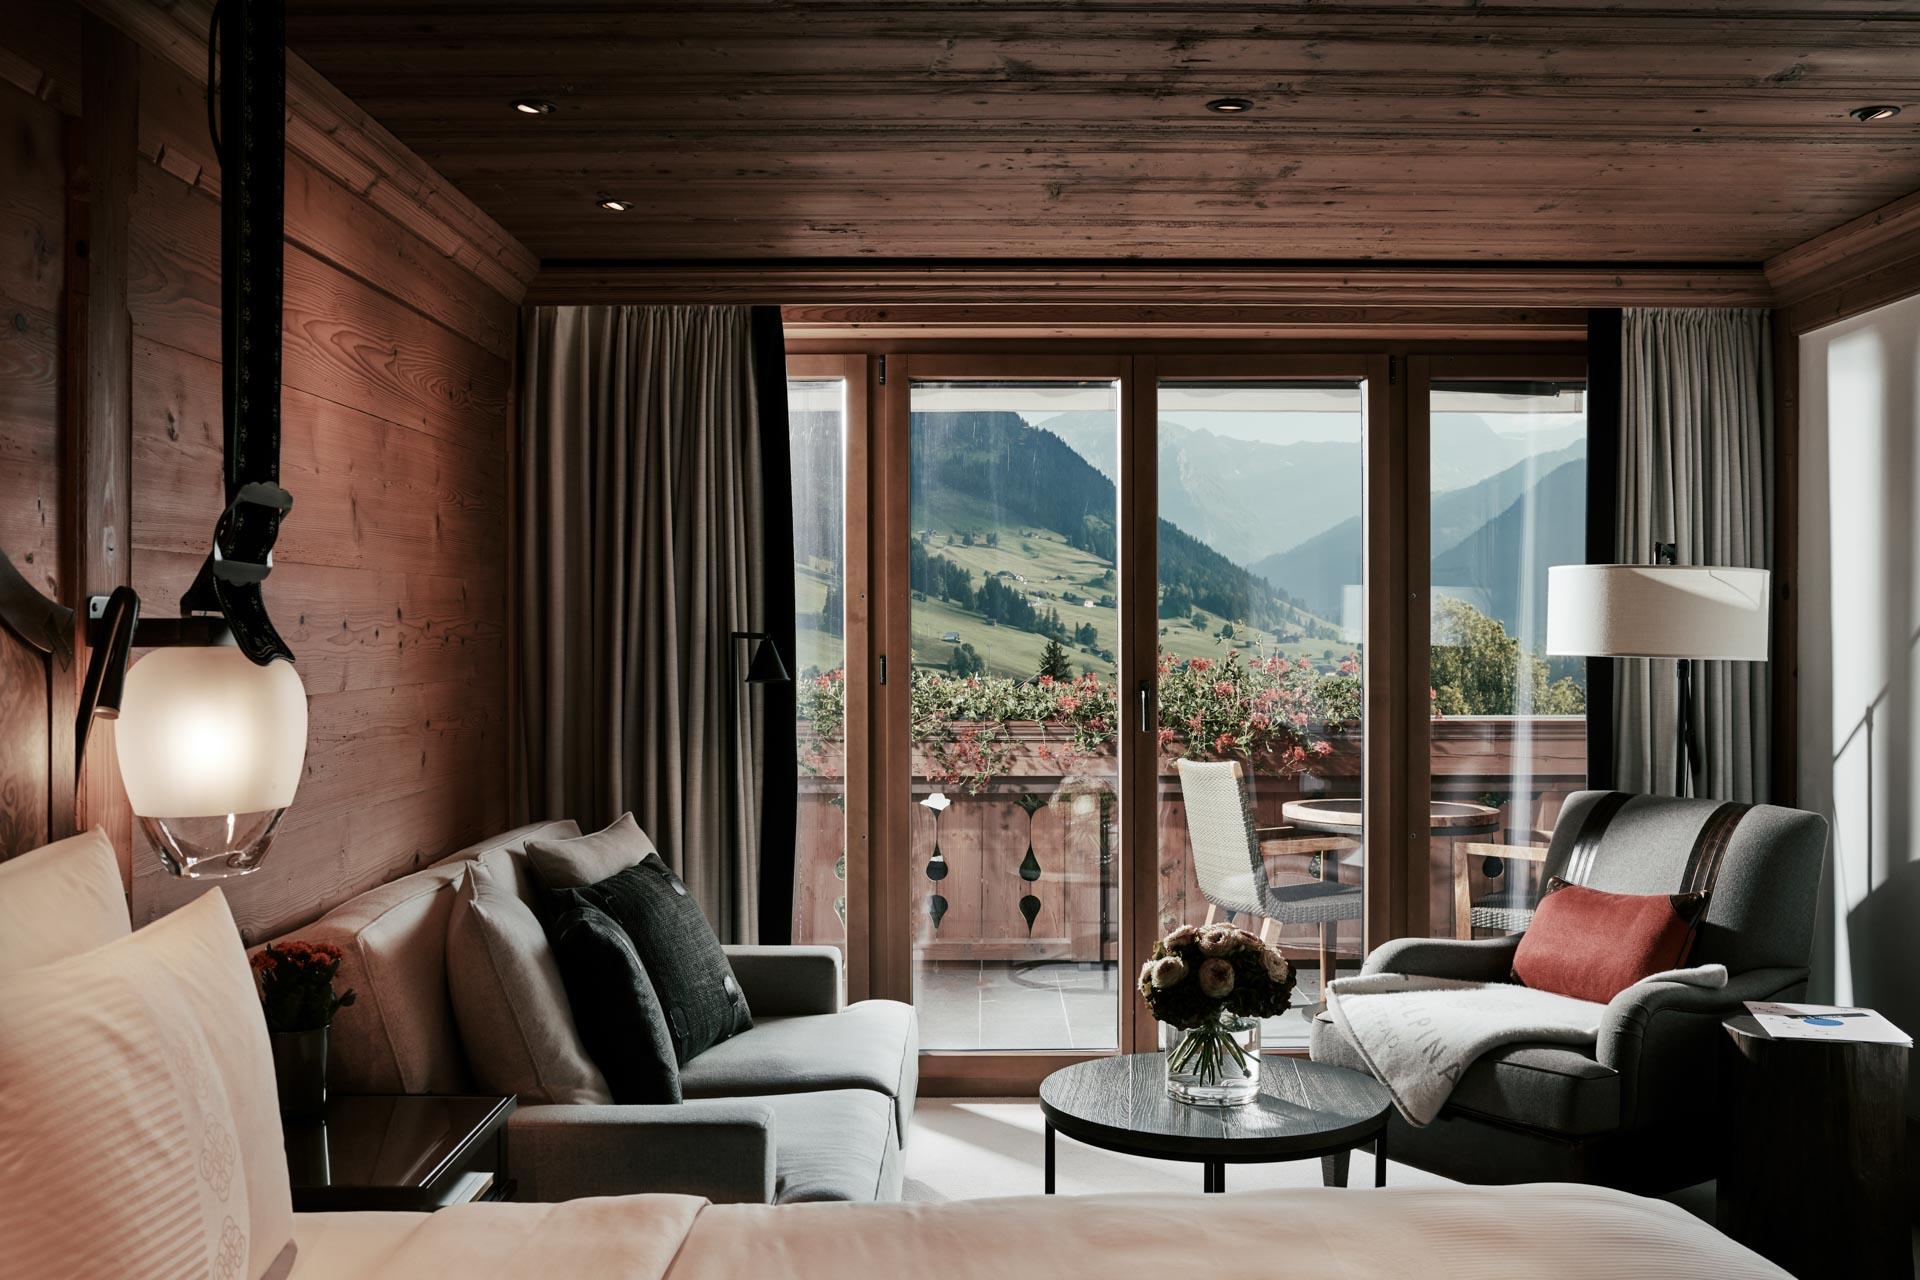 deluxe-room-gstaad-the-alpina-gstaad-301-001.jpg